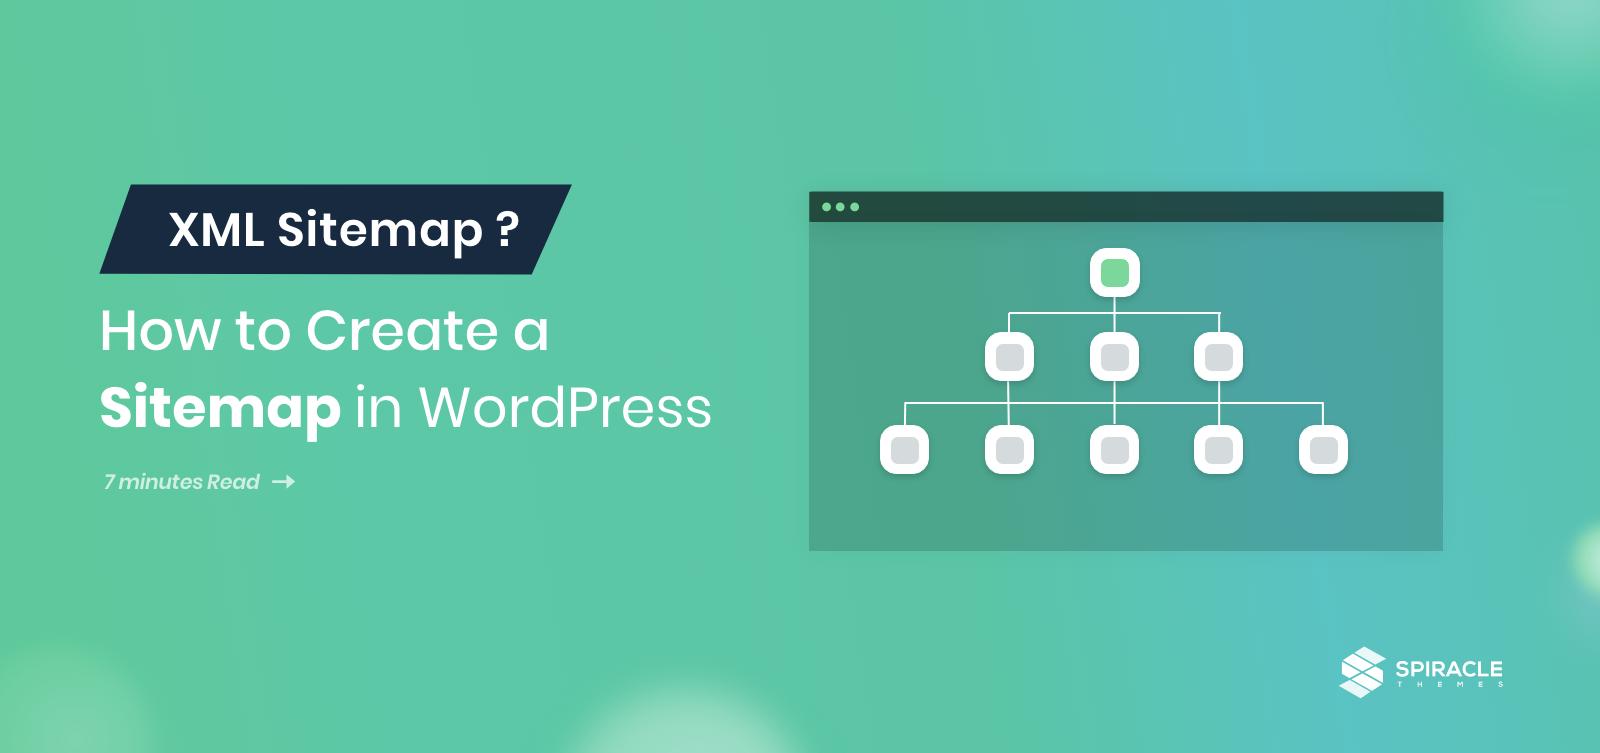 how to create XML sitemap in WordPress